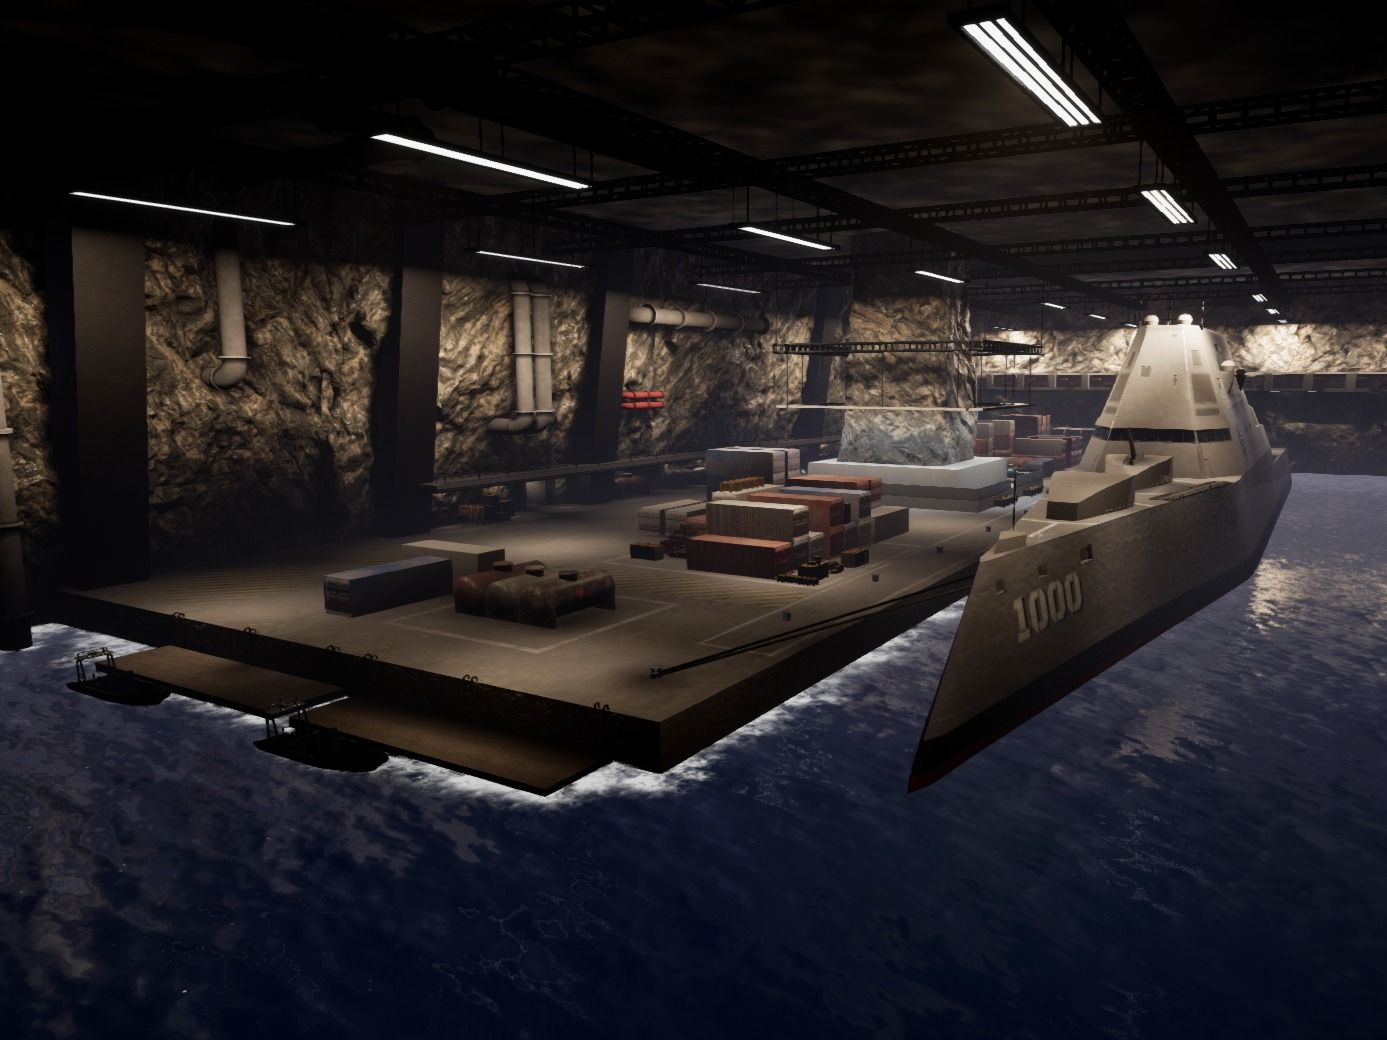 Top Secret Military Base